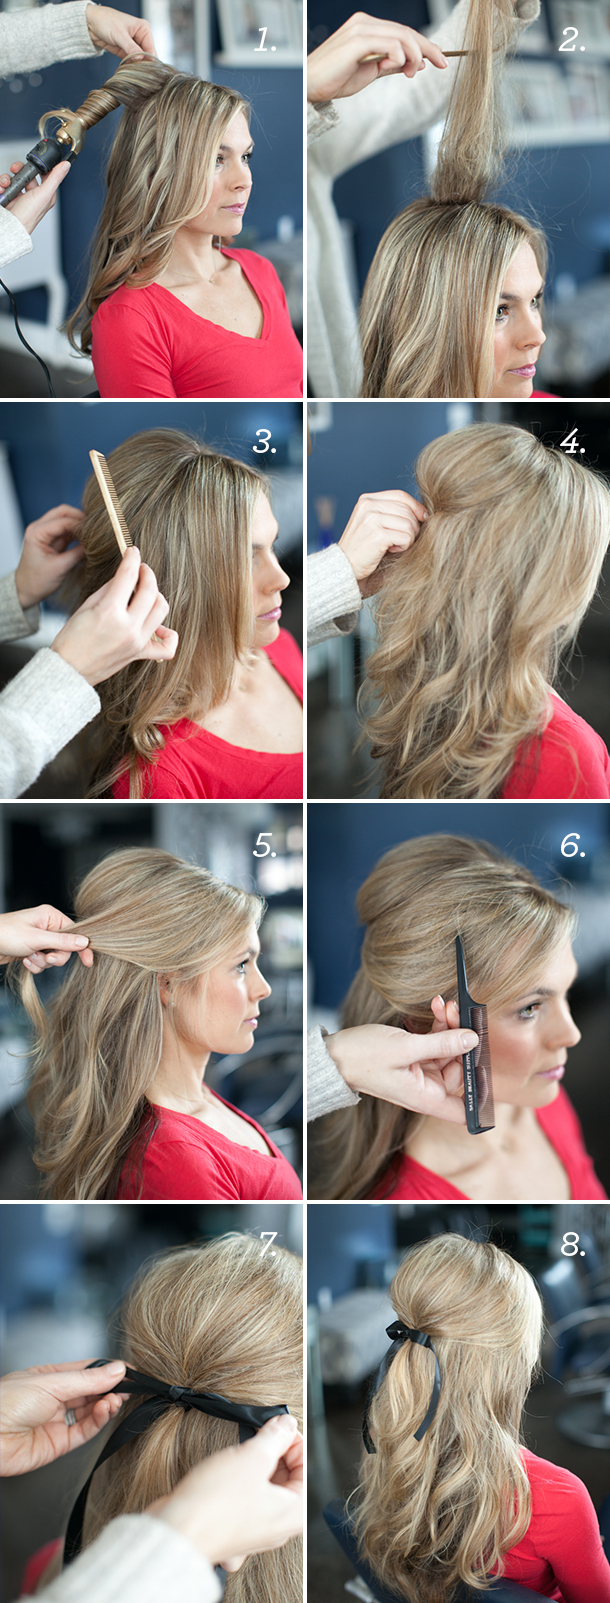 penteados bonitos para cabelos cacheados